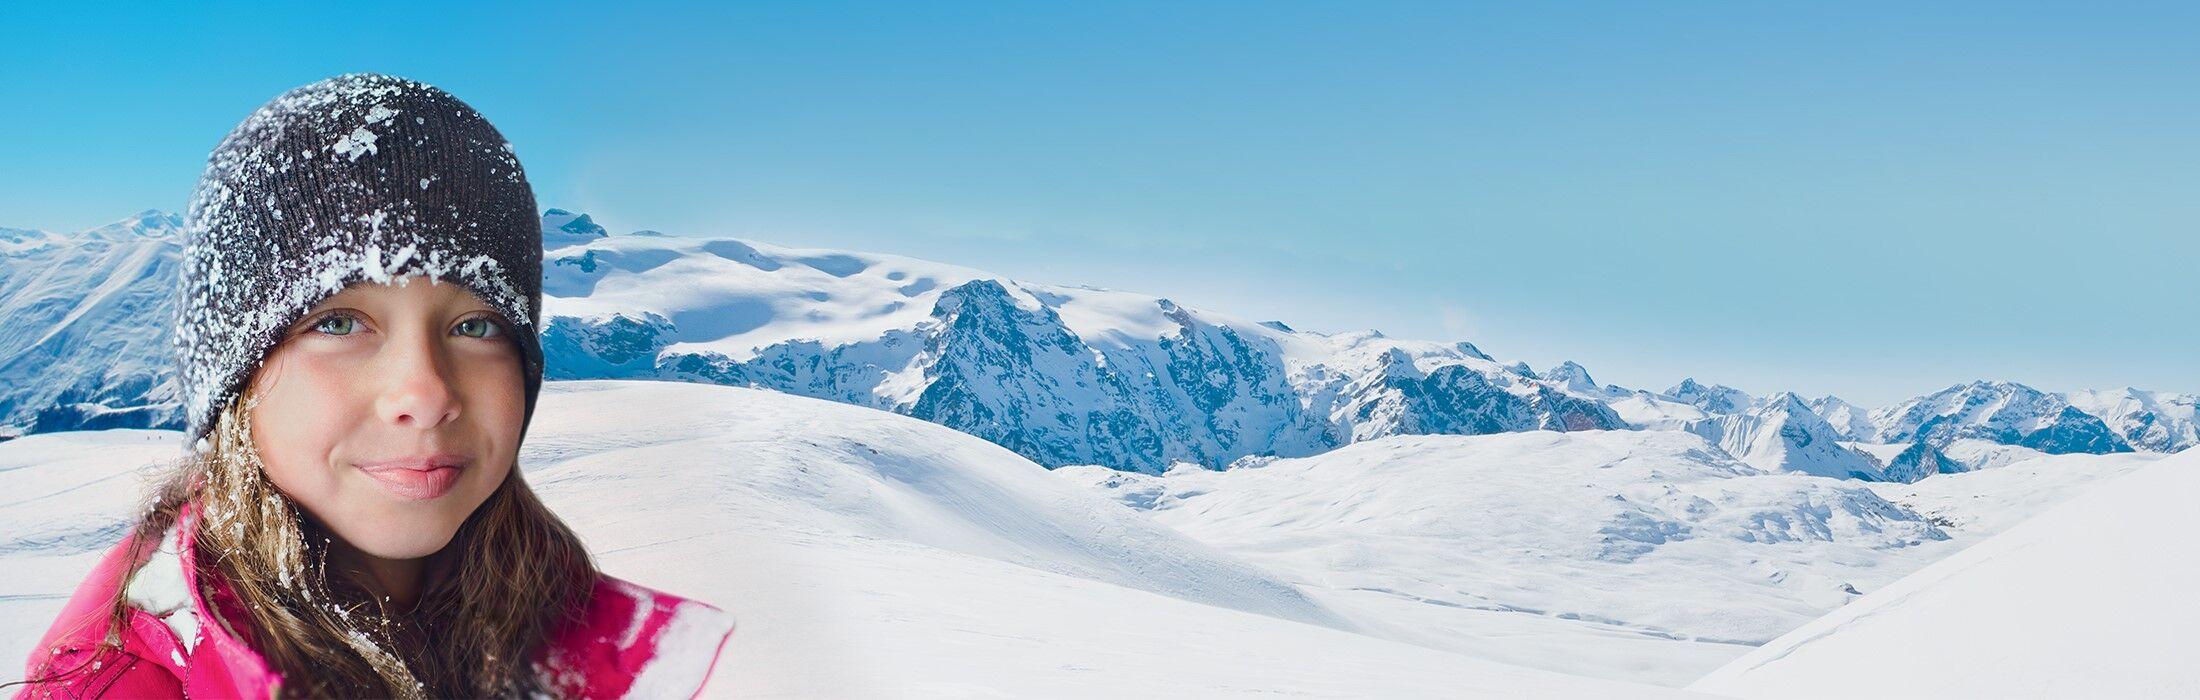 family ski holiday rentals